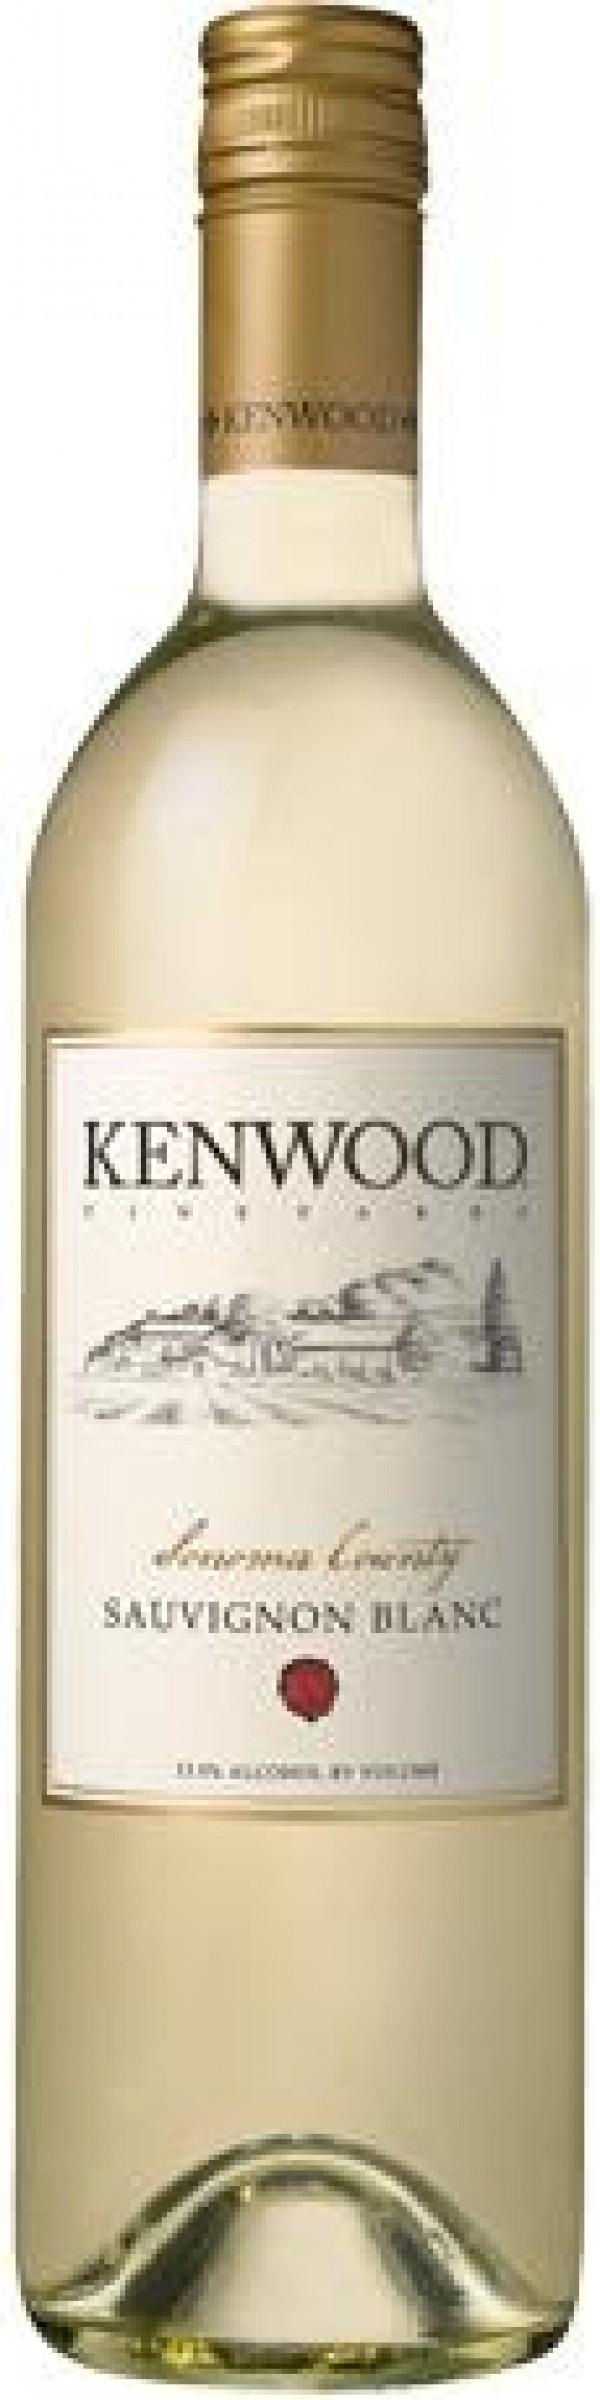 Kenwood Sauvignon Blanc Sonoma County